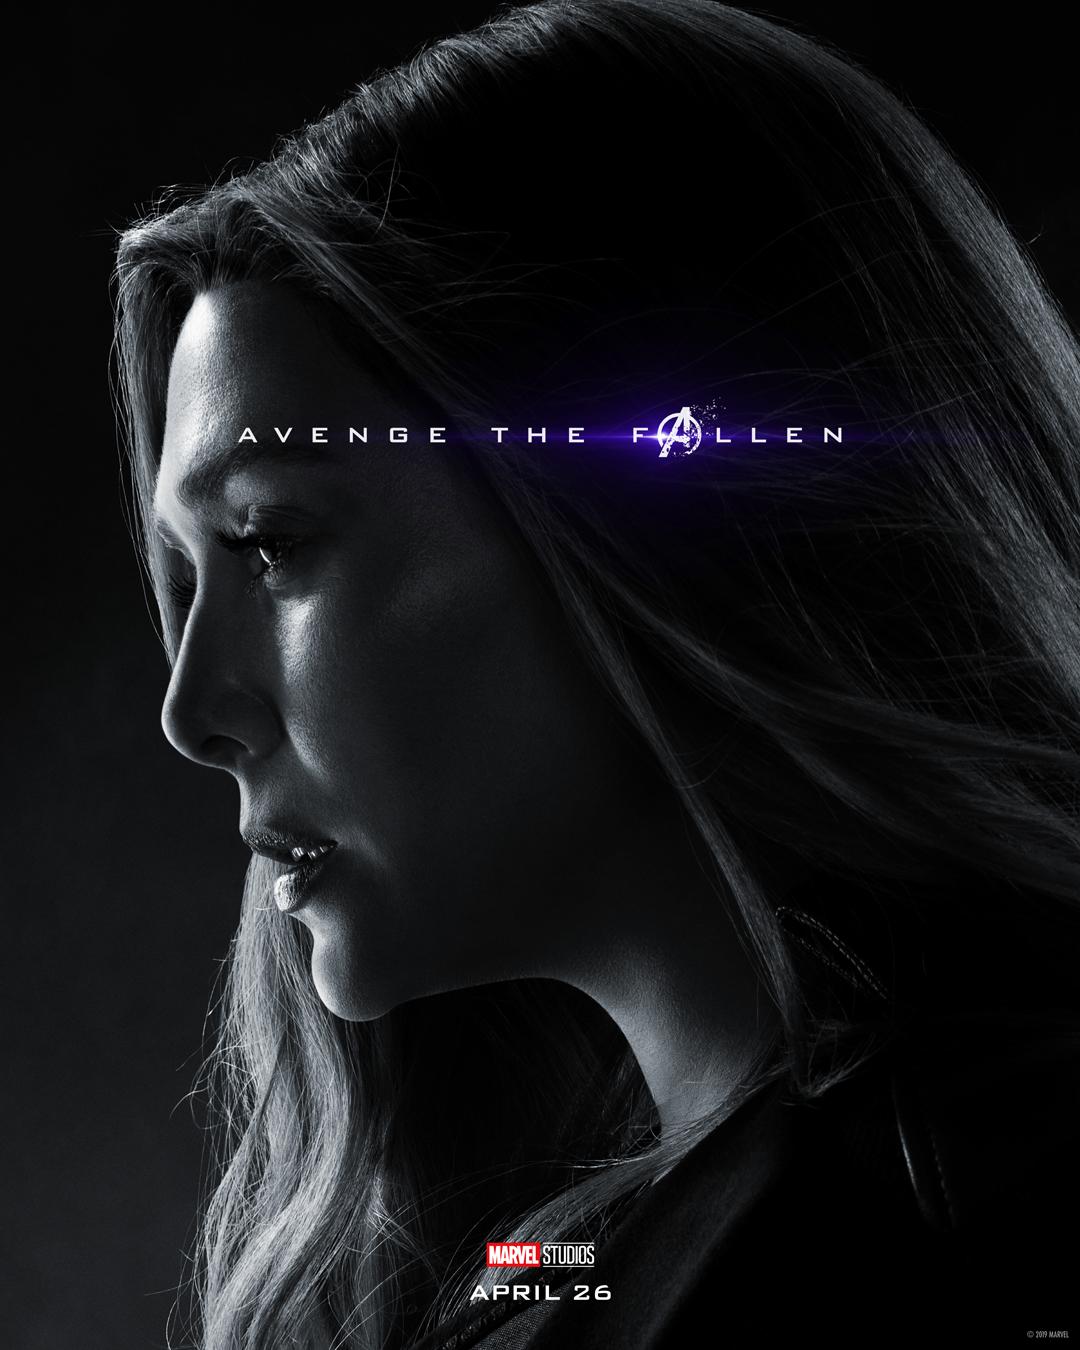 AvengersEndgame_Avenge_Honor Series_ScarletWitch